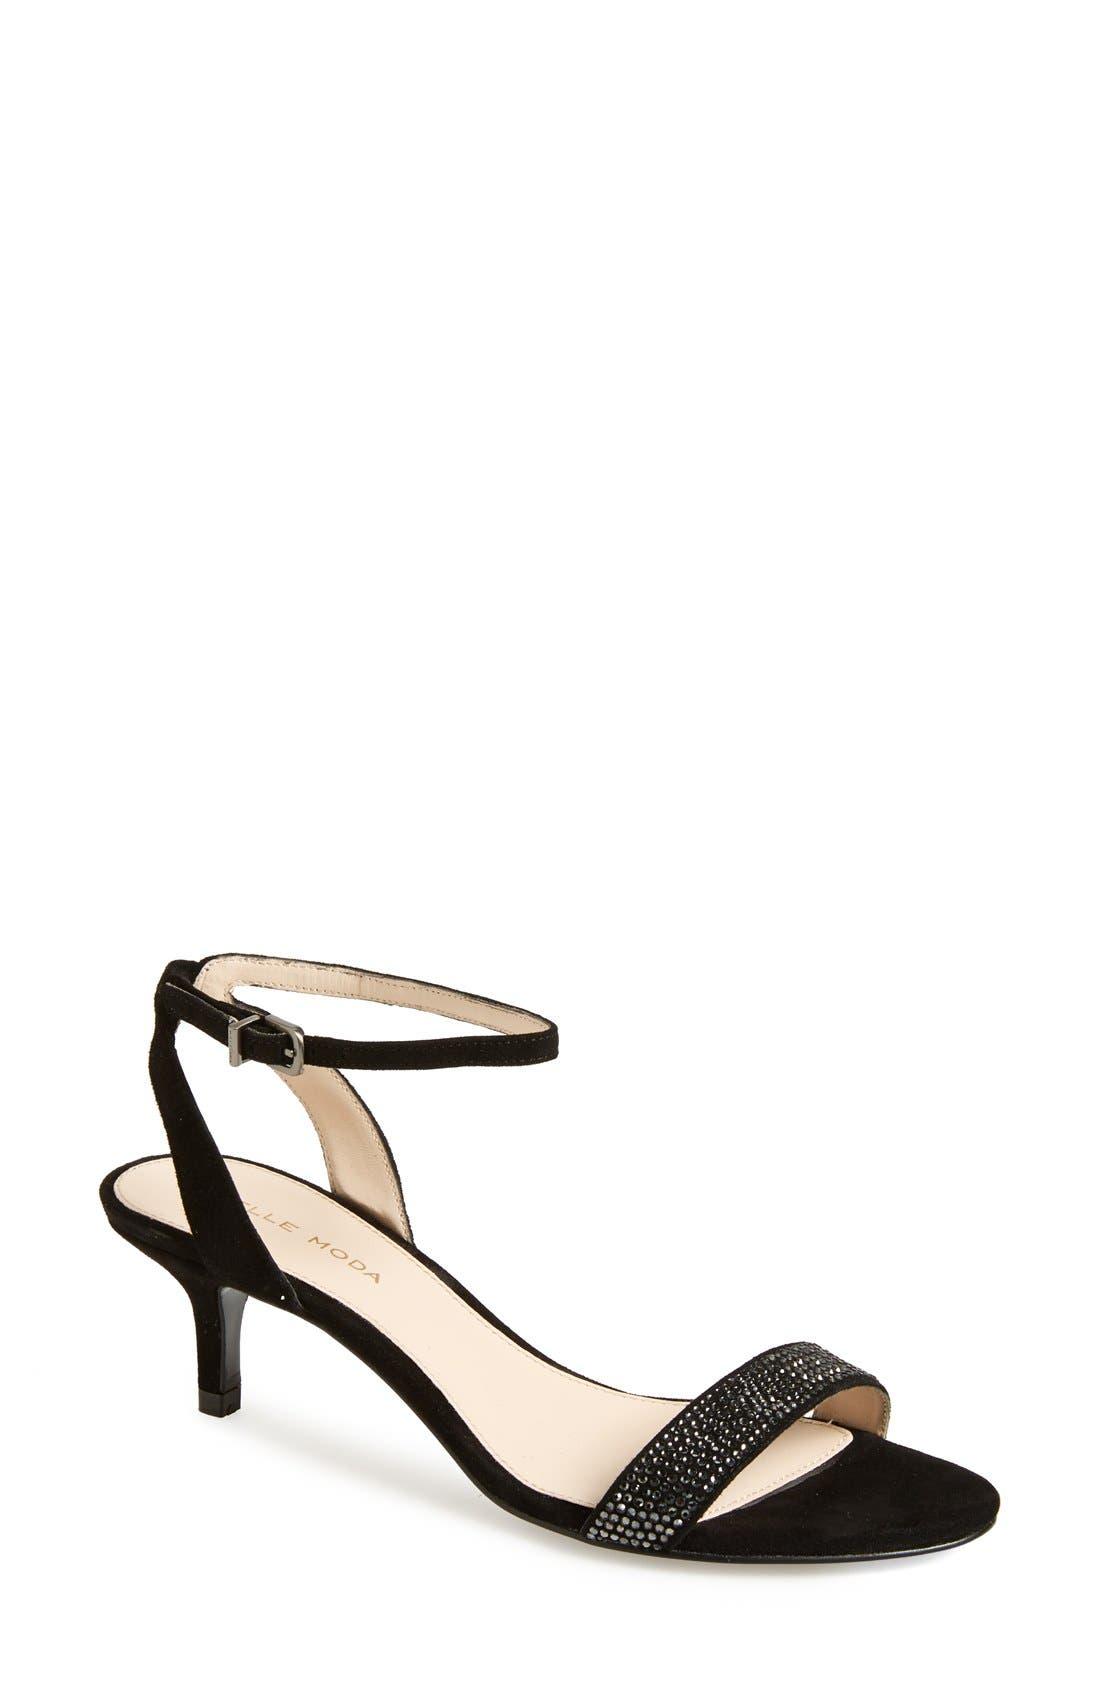 Alternate Image 1 Selected - Pelle Moda 'Fabia' Sandal (Women)